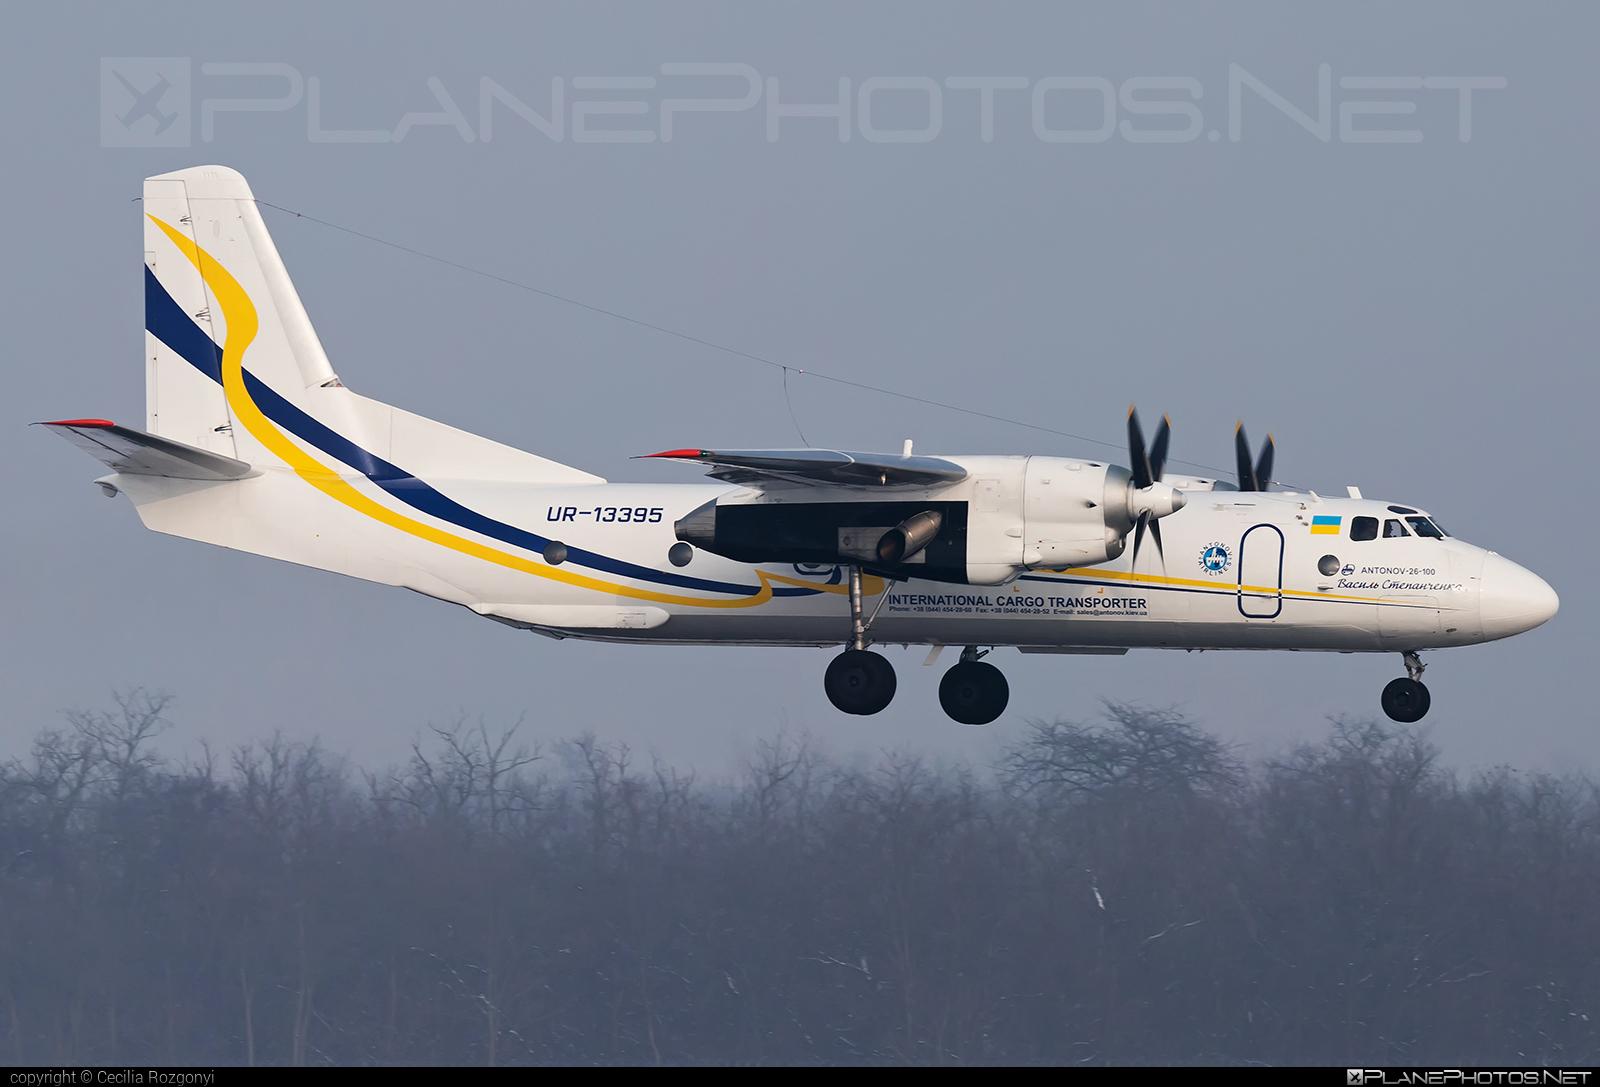 Antonov An-26 - UR-13395 operated by Antonov Airlines #an26 #antonov #antonov26